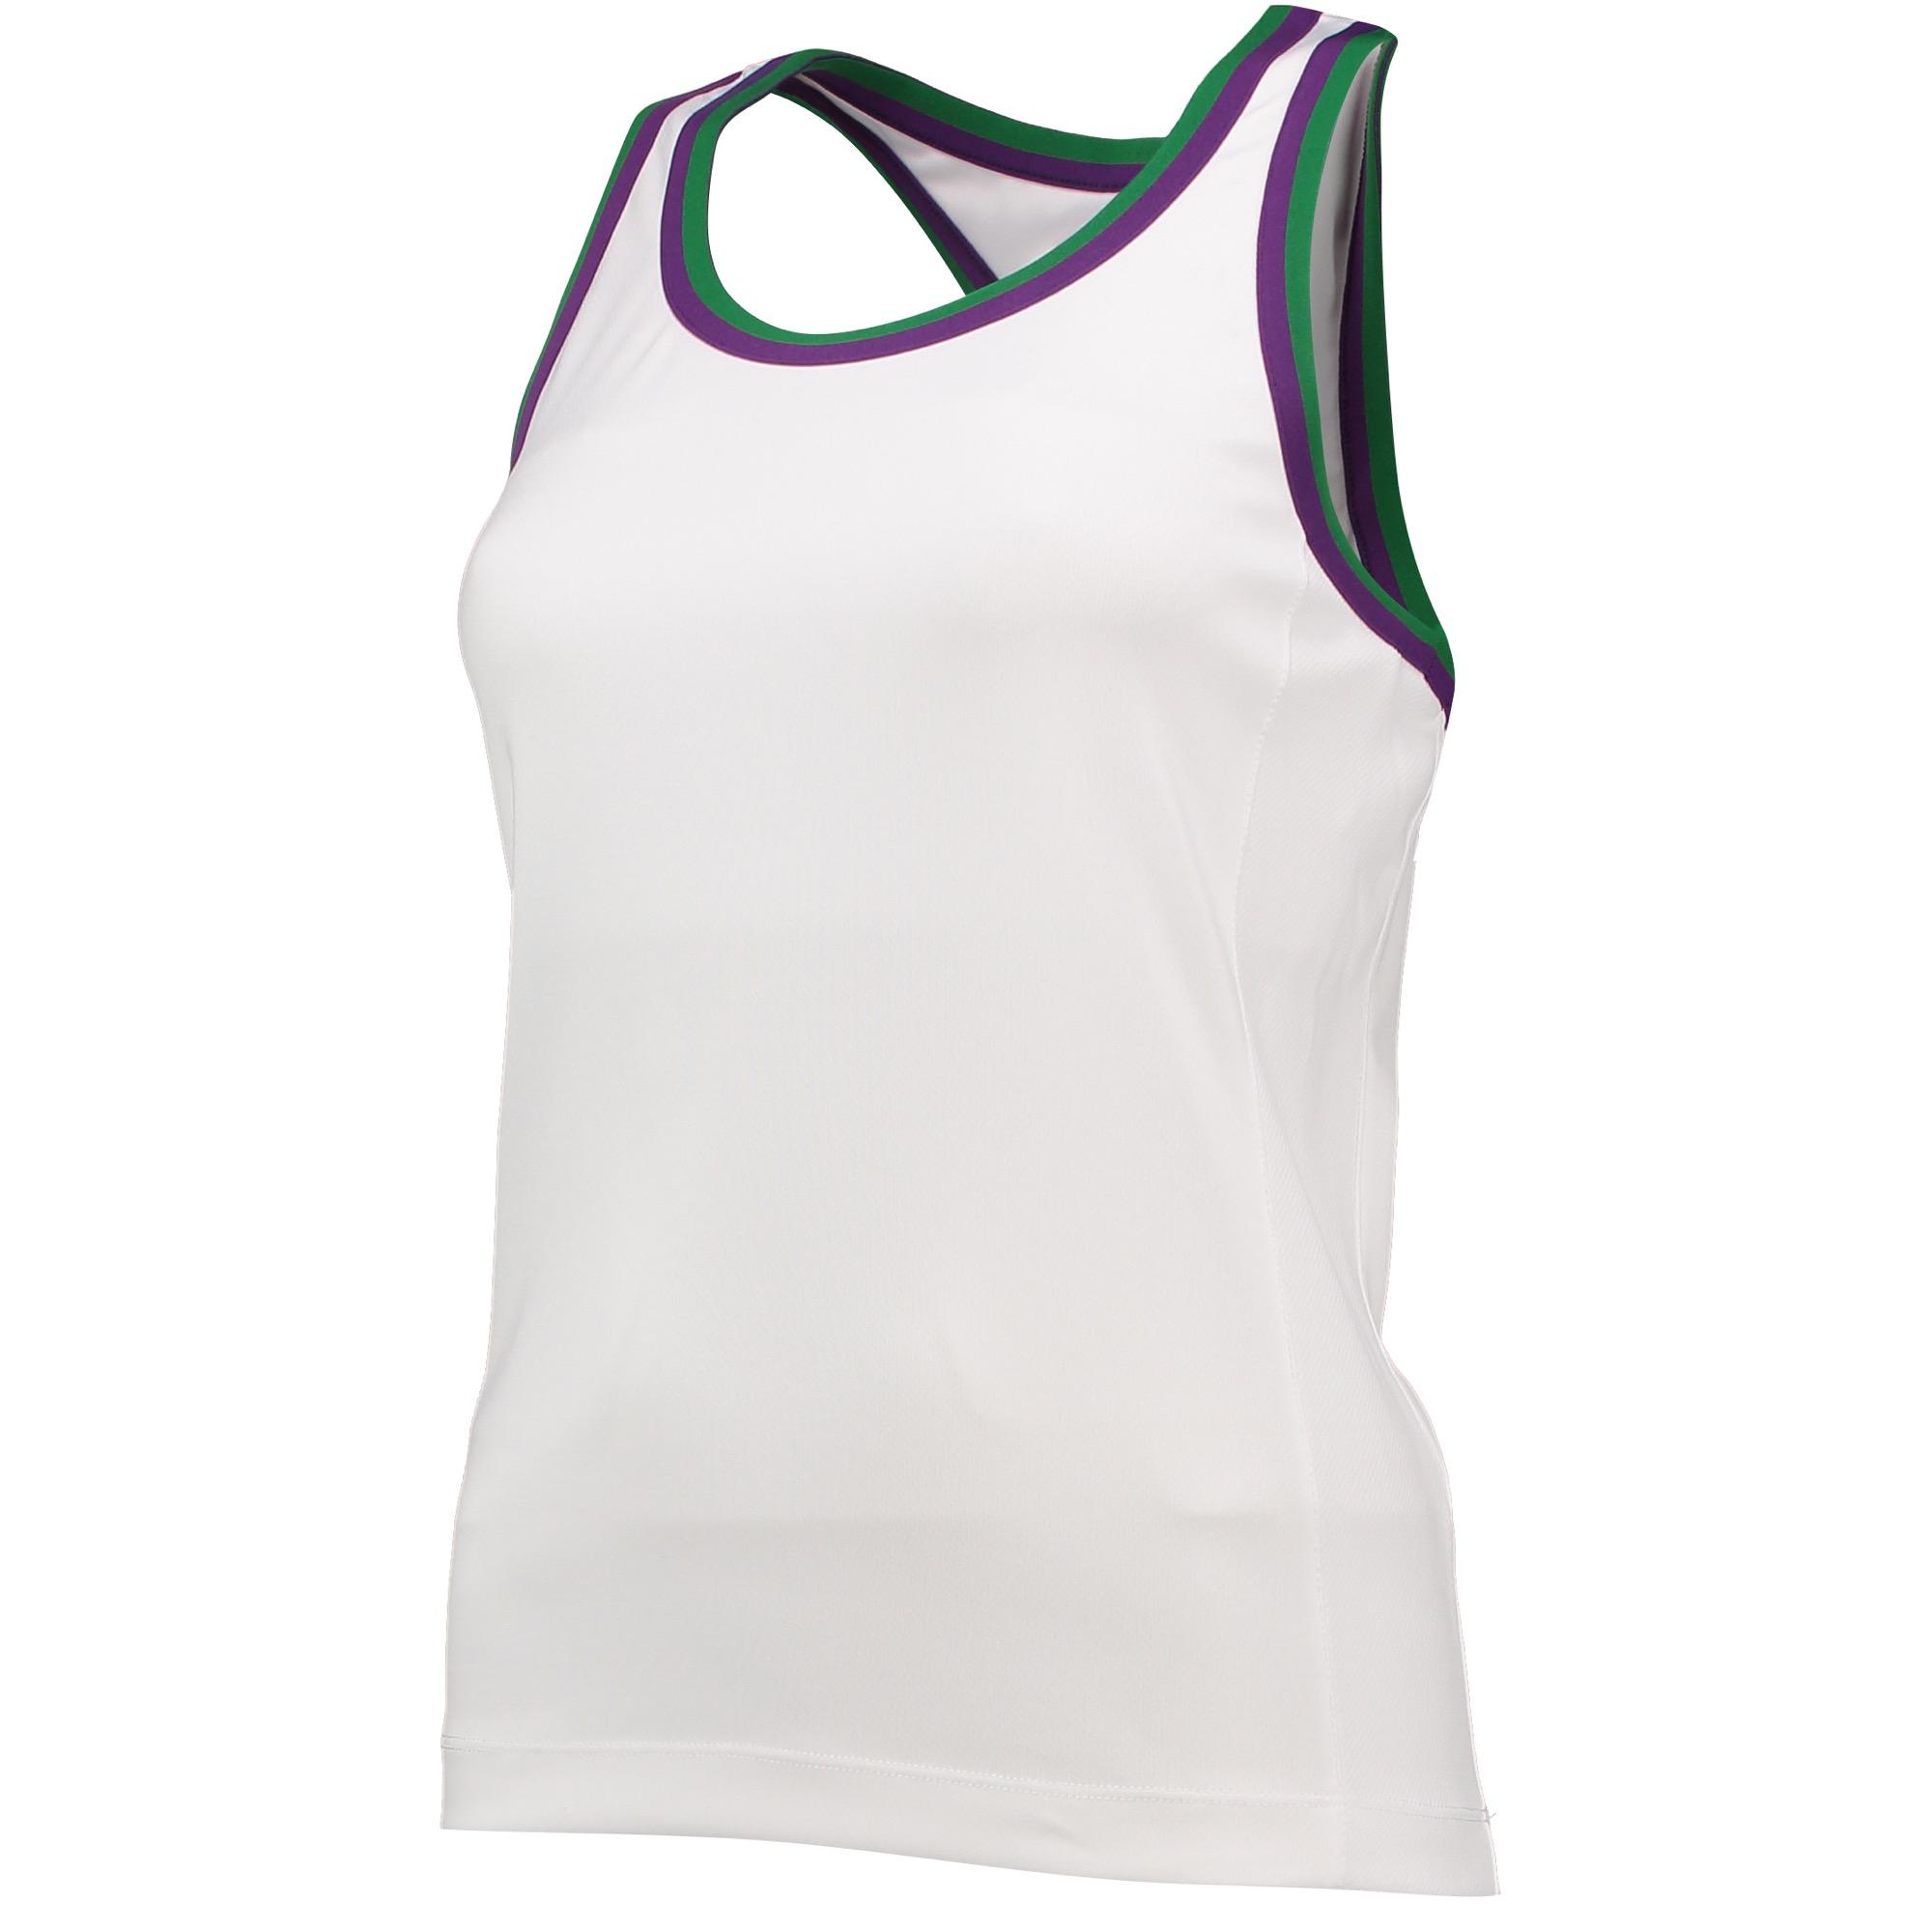 Wimbledon Racer Back Tank - Ladies